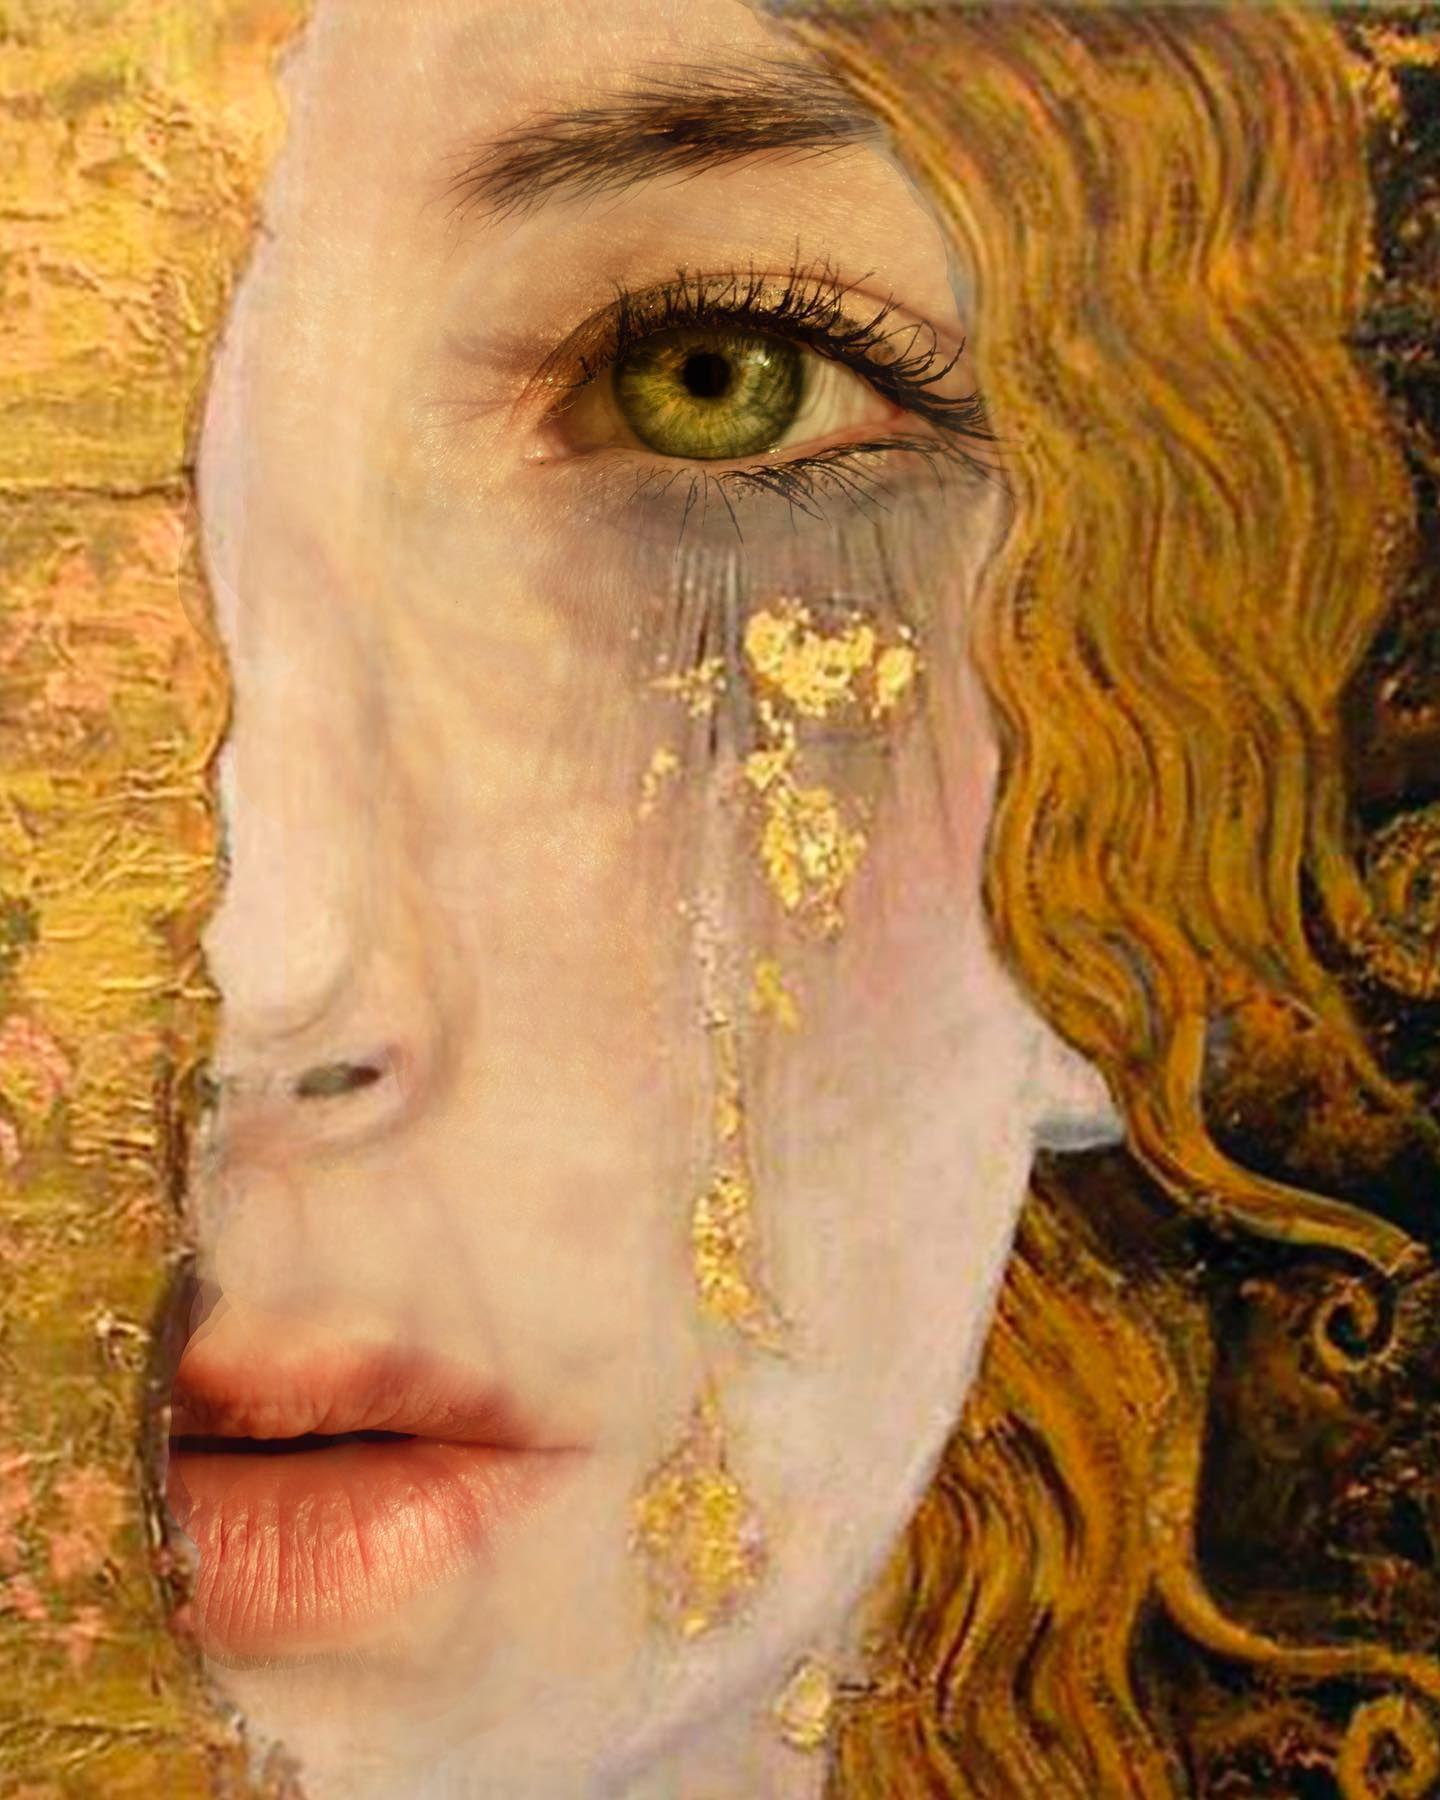 """ Larmes d'or "" ⠀ La leggenda narra ⠀ che Freya ⠀ piangesse lacrime d'oro, ⠀ per amore, ⠀ tingendo l'alba dei suoi colori vividi. ⠀ ___________________________________  #777luckyfish #forevermagazine #onearthmagazine"